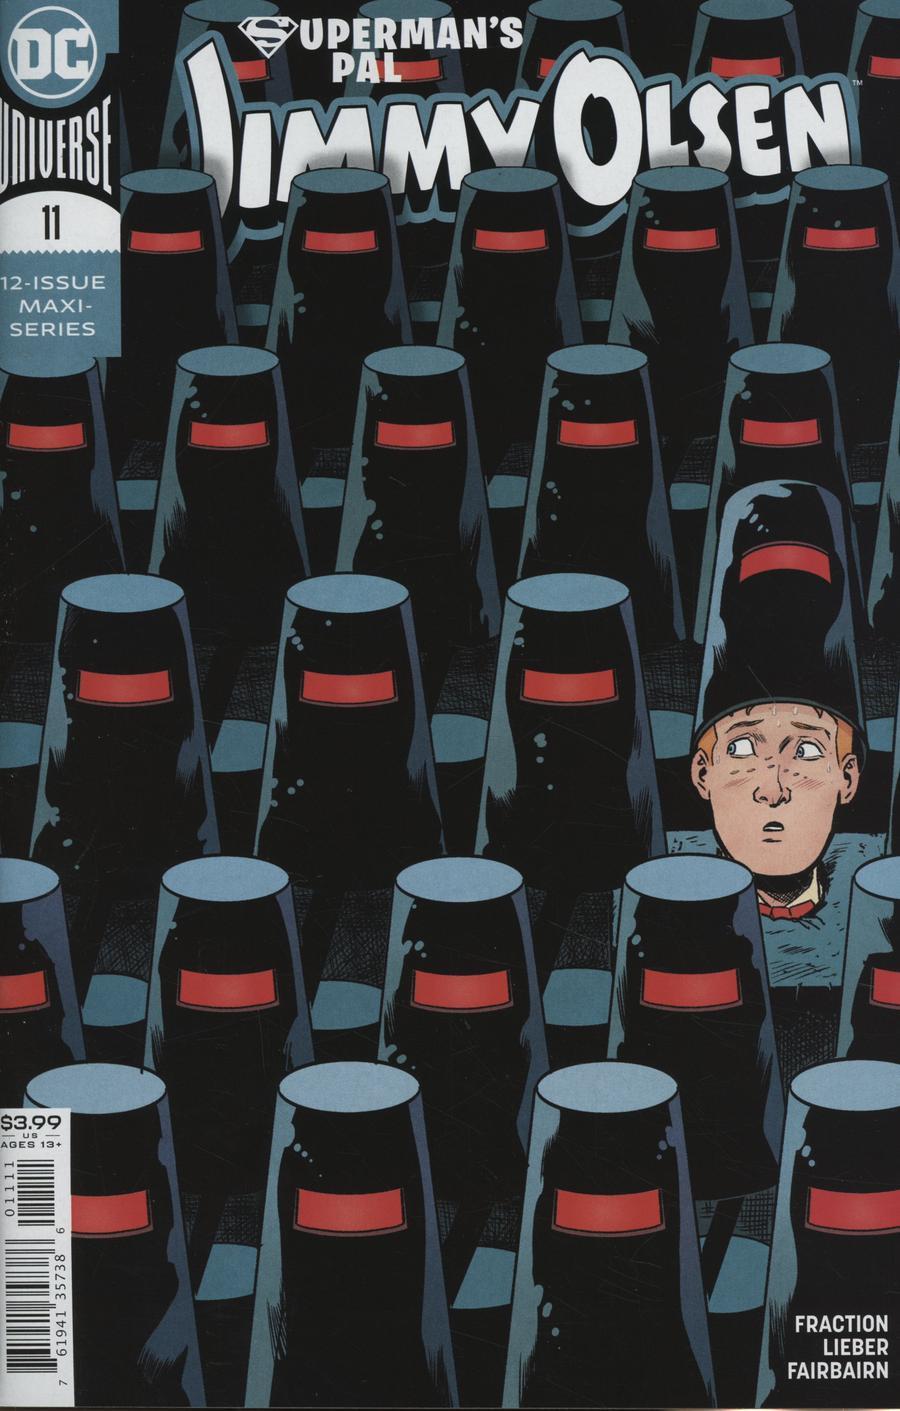 Supermans Pal Jimmy Olsen Vol 2 #11 Cover A Regular Steve Lieber Cover